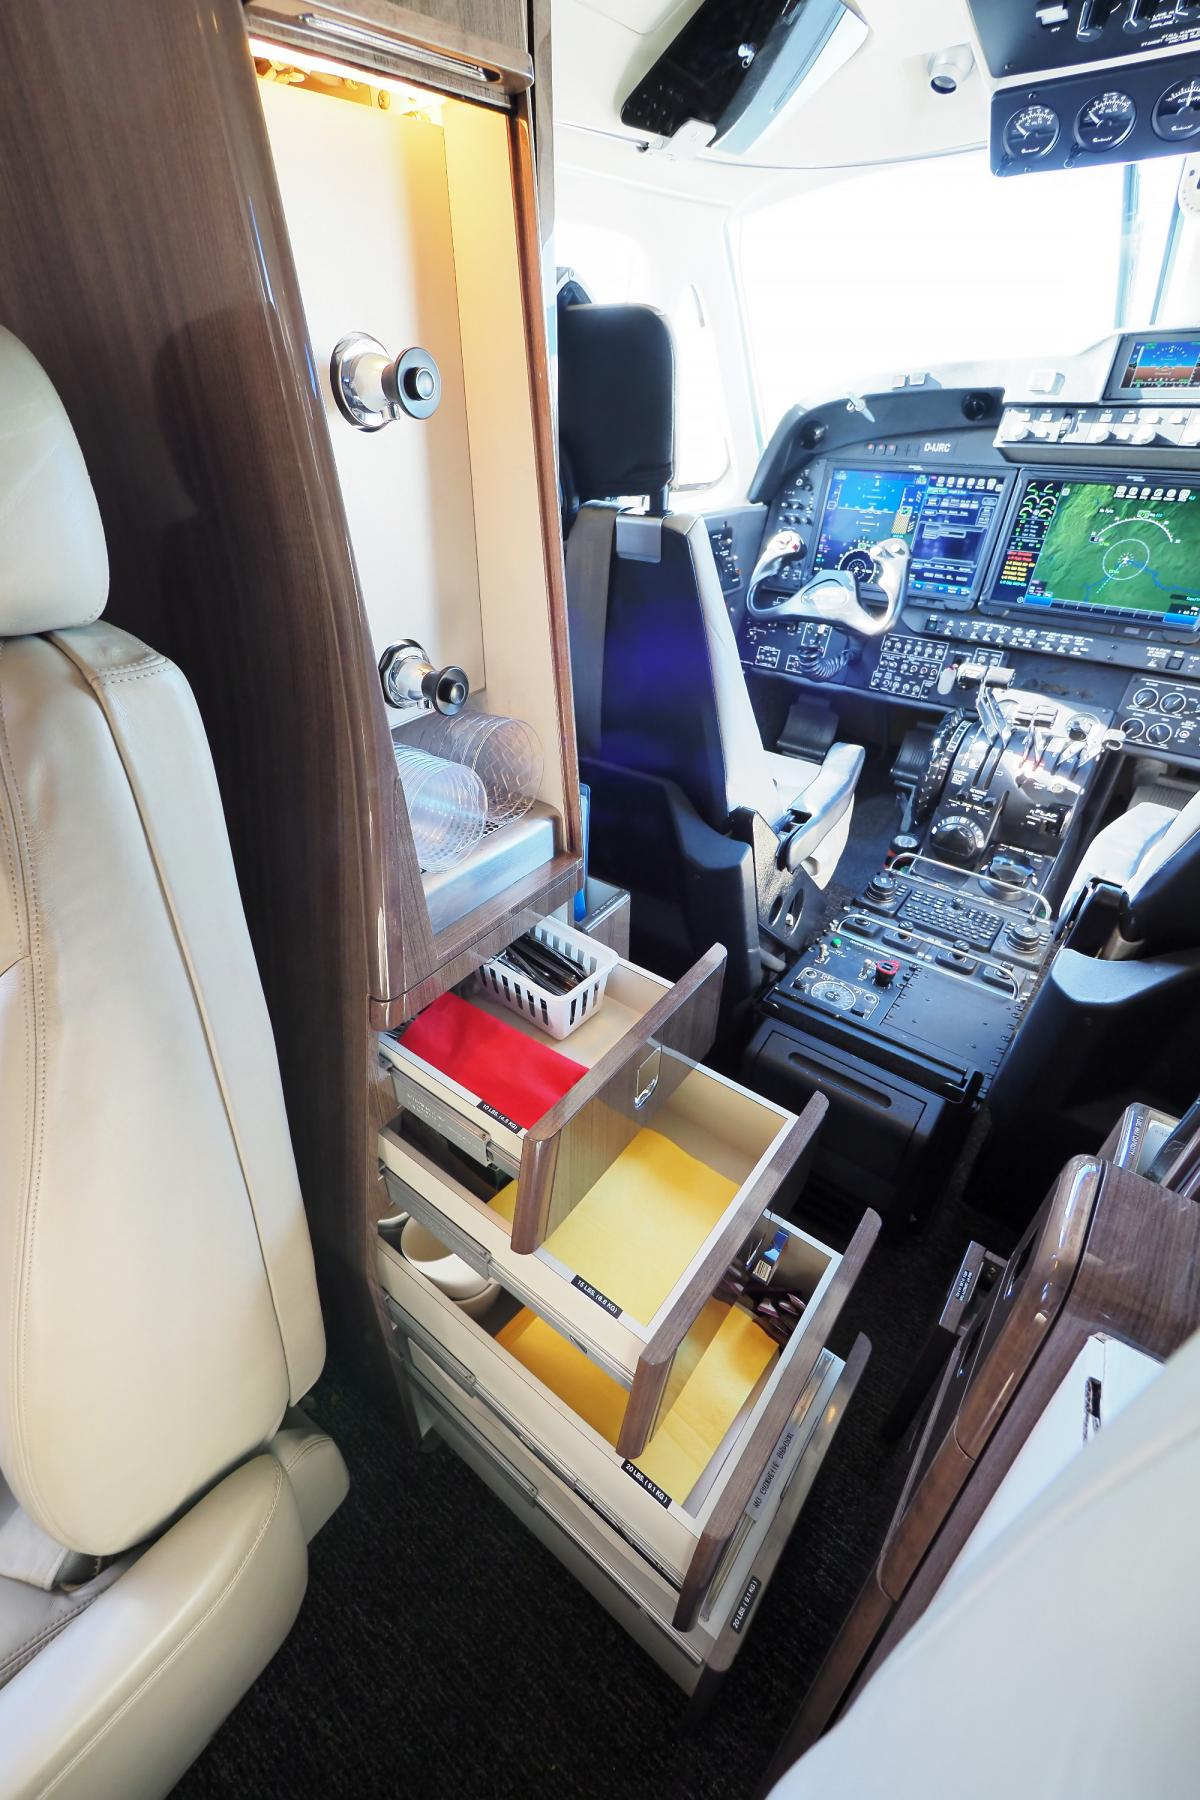 2016 Beech King Air 250 Photo 6